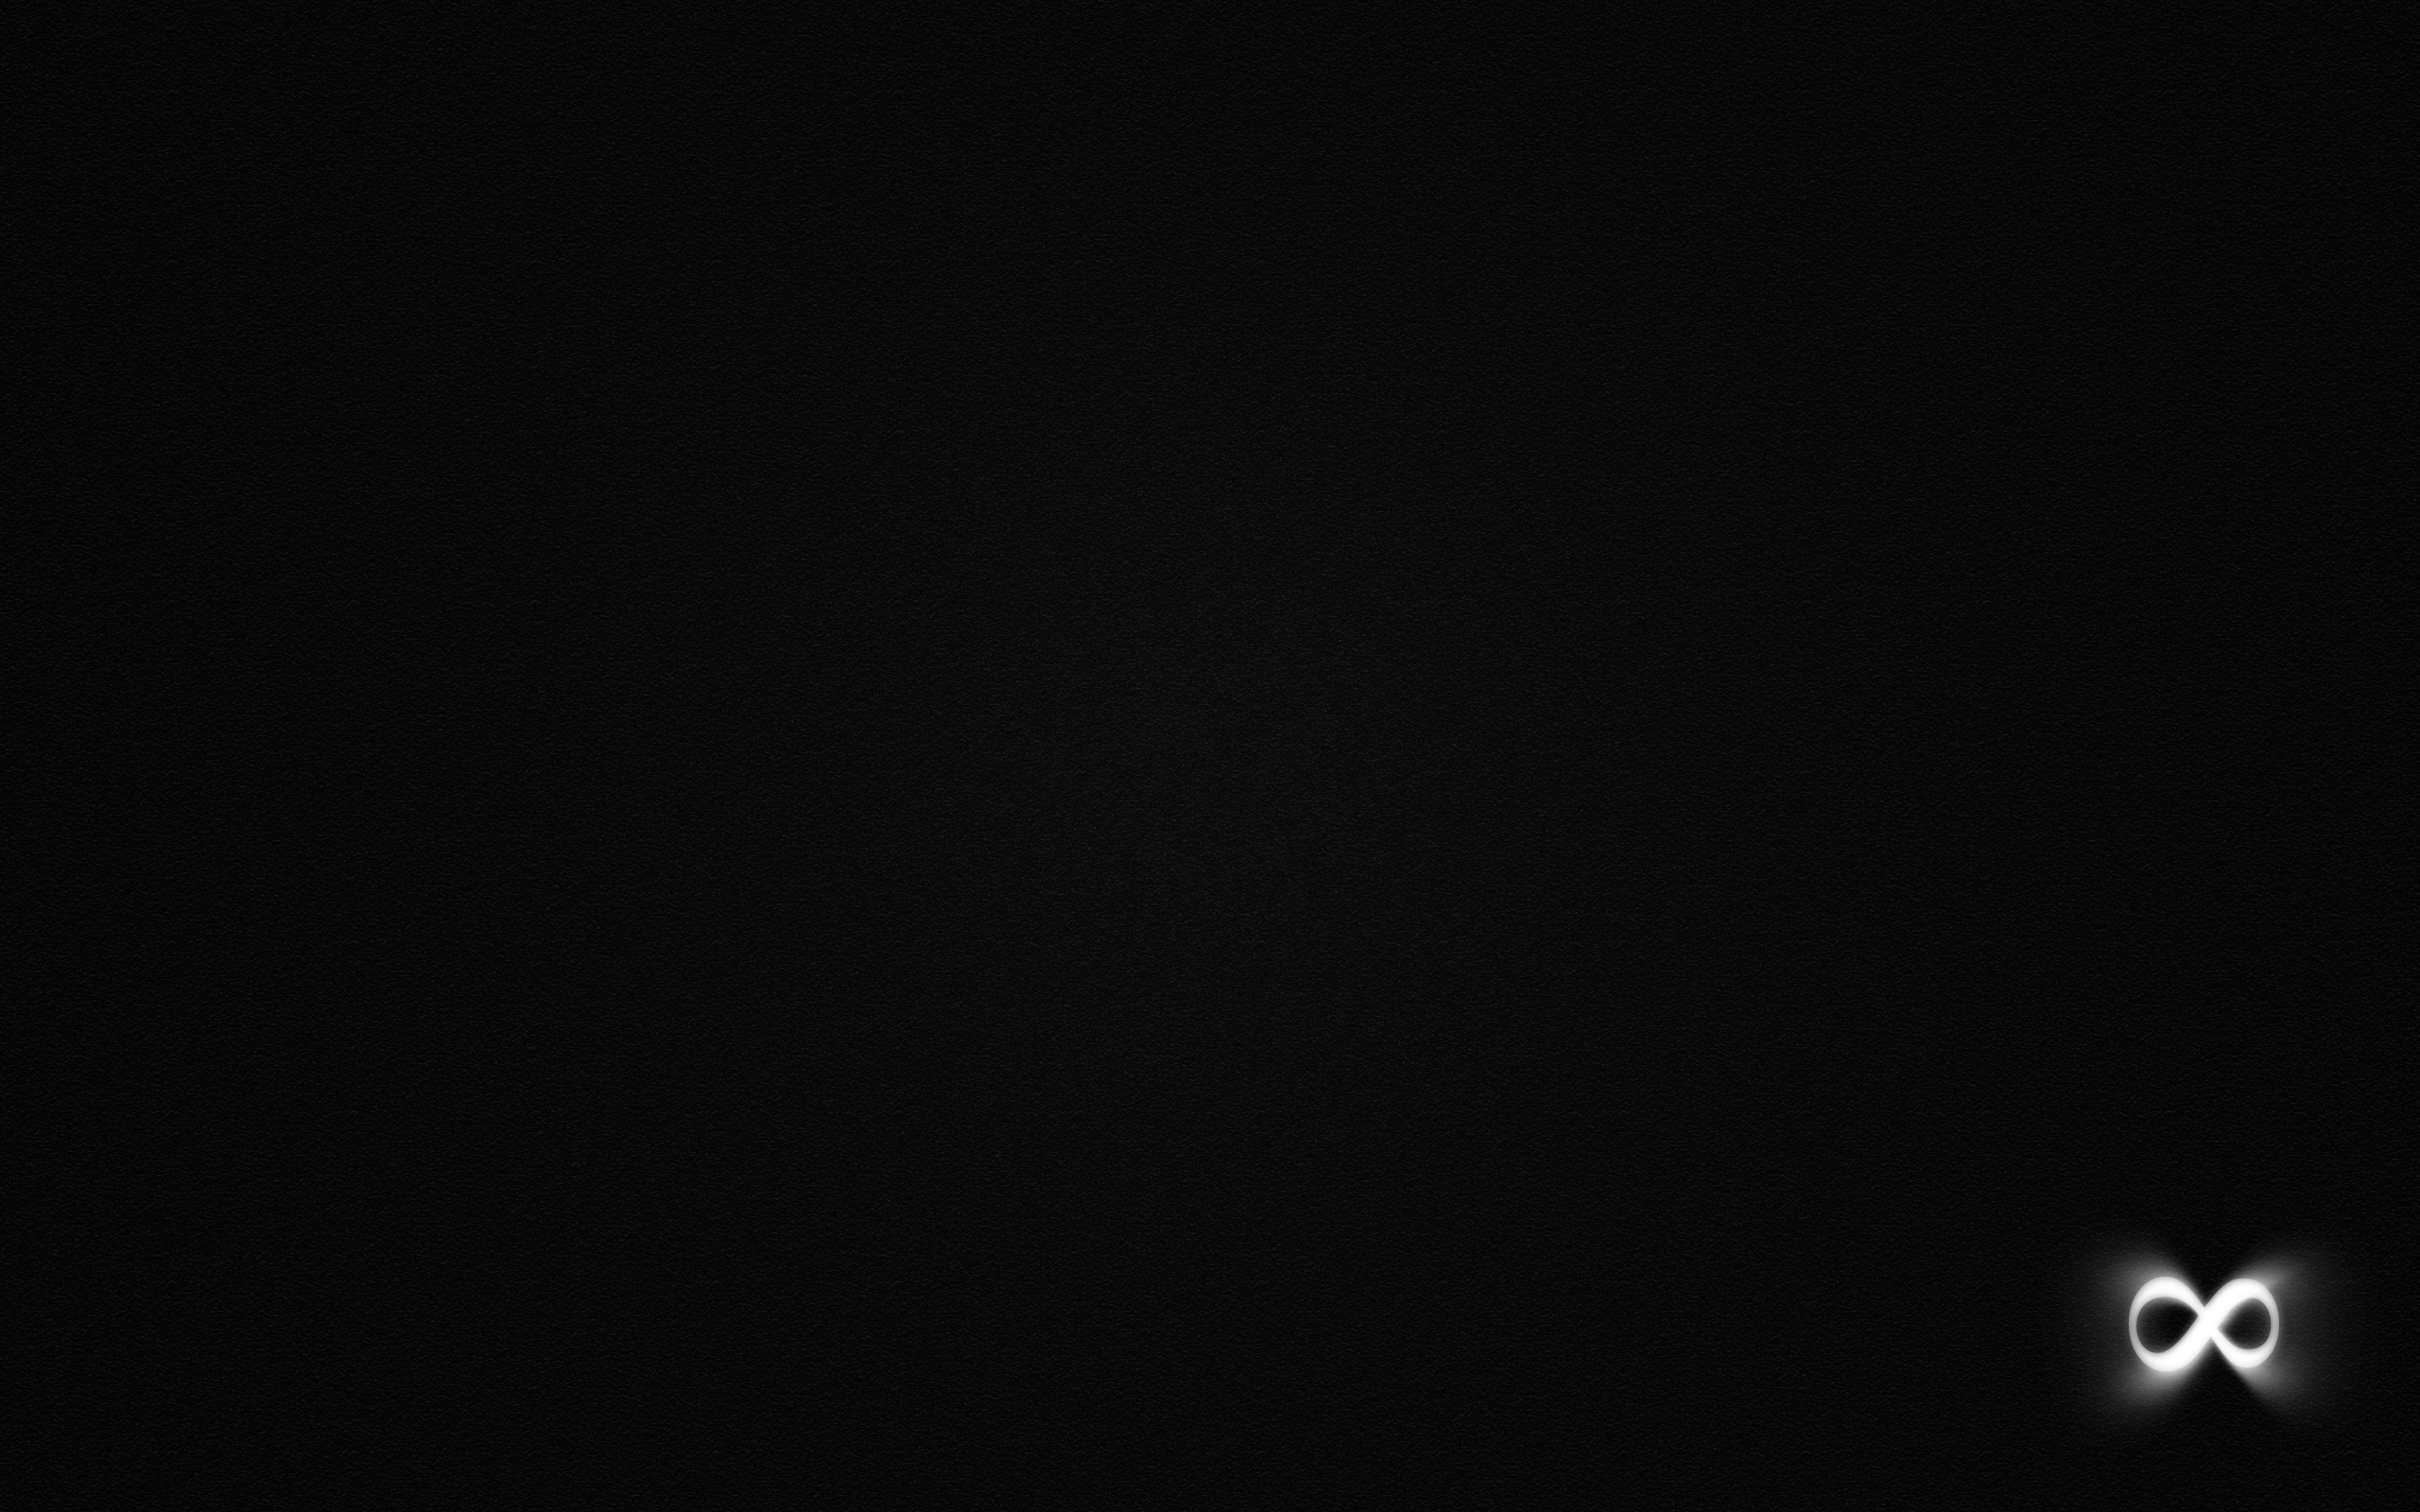 November iphone wallpaper tumblr - Pretty Infinity Wallpapers Tumblr Wallpaper Infinity By Gormed